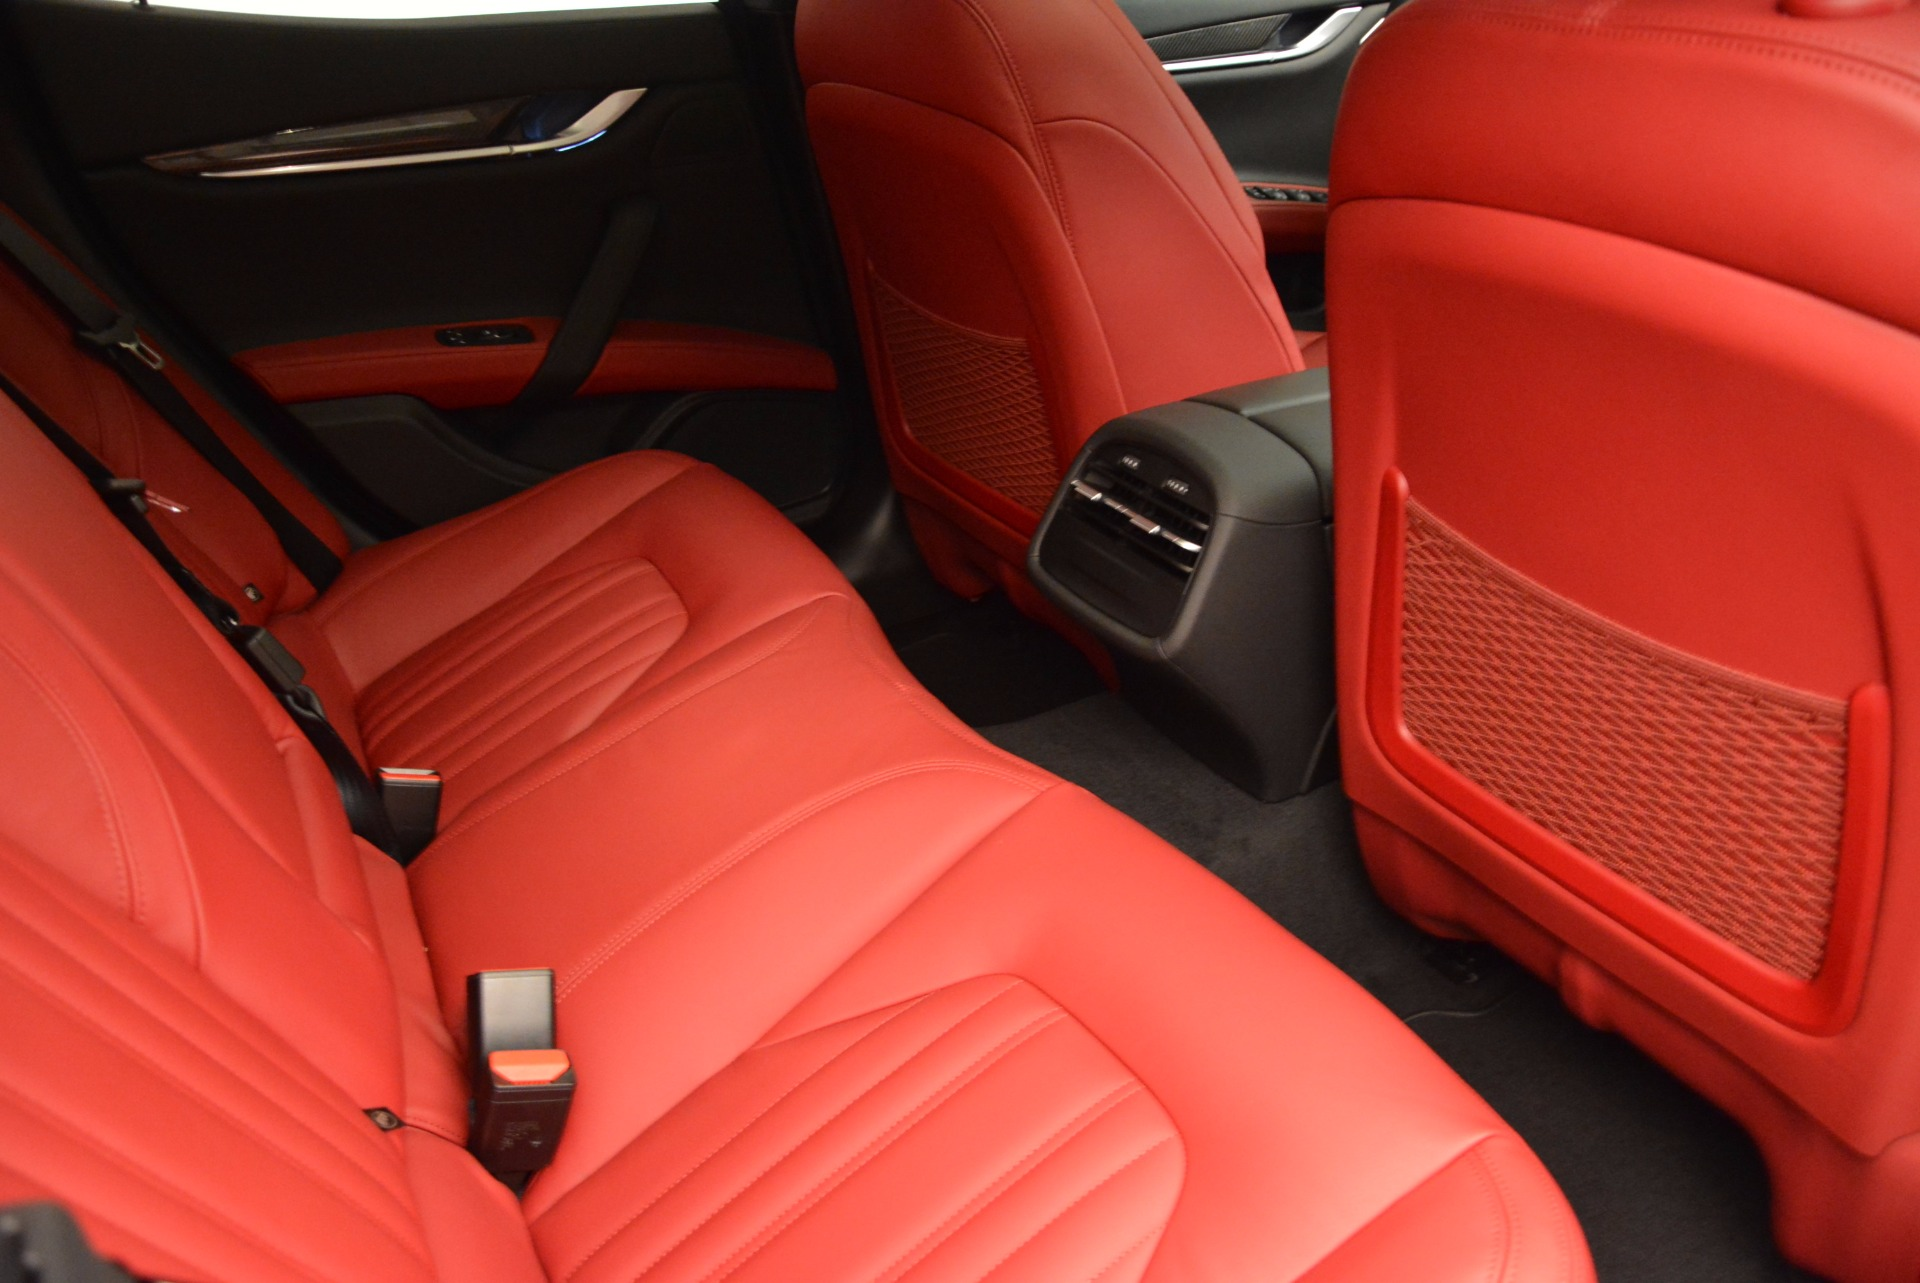 Used 2015 Maserati Ghibli S Q4 For Sale In Greenwich, CT 1290_p23